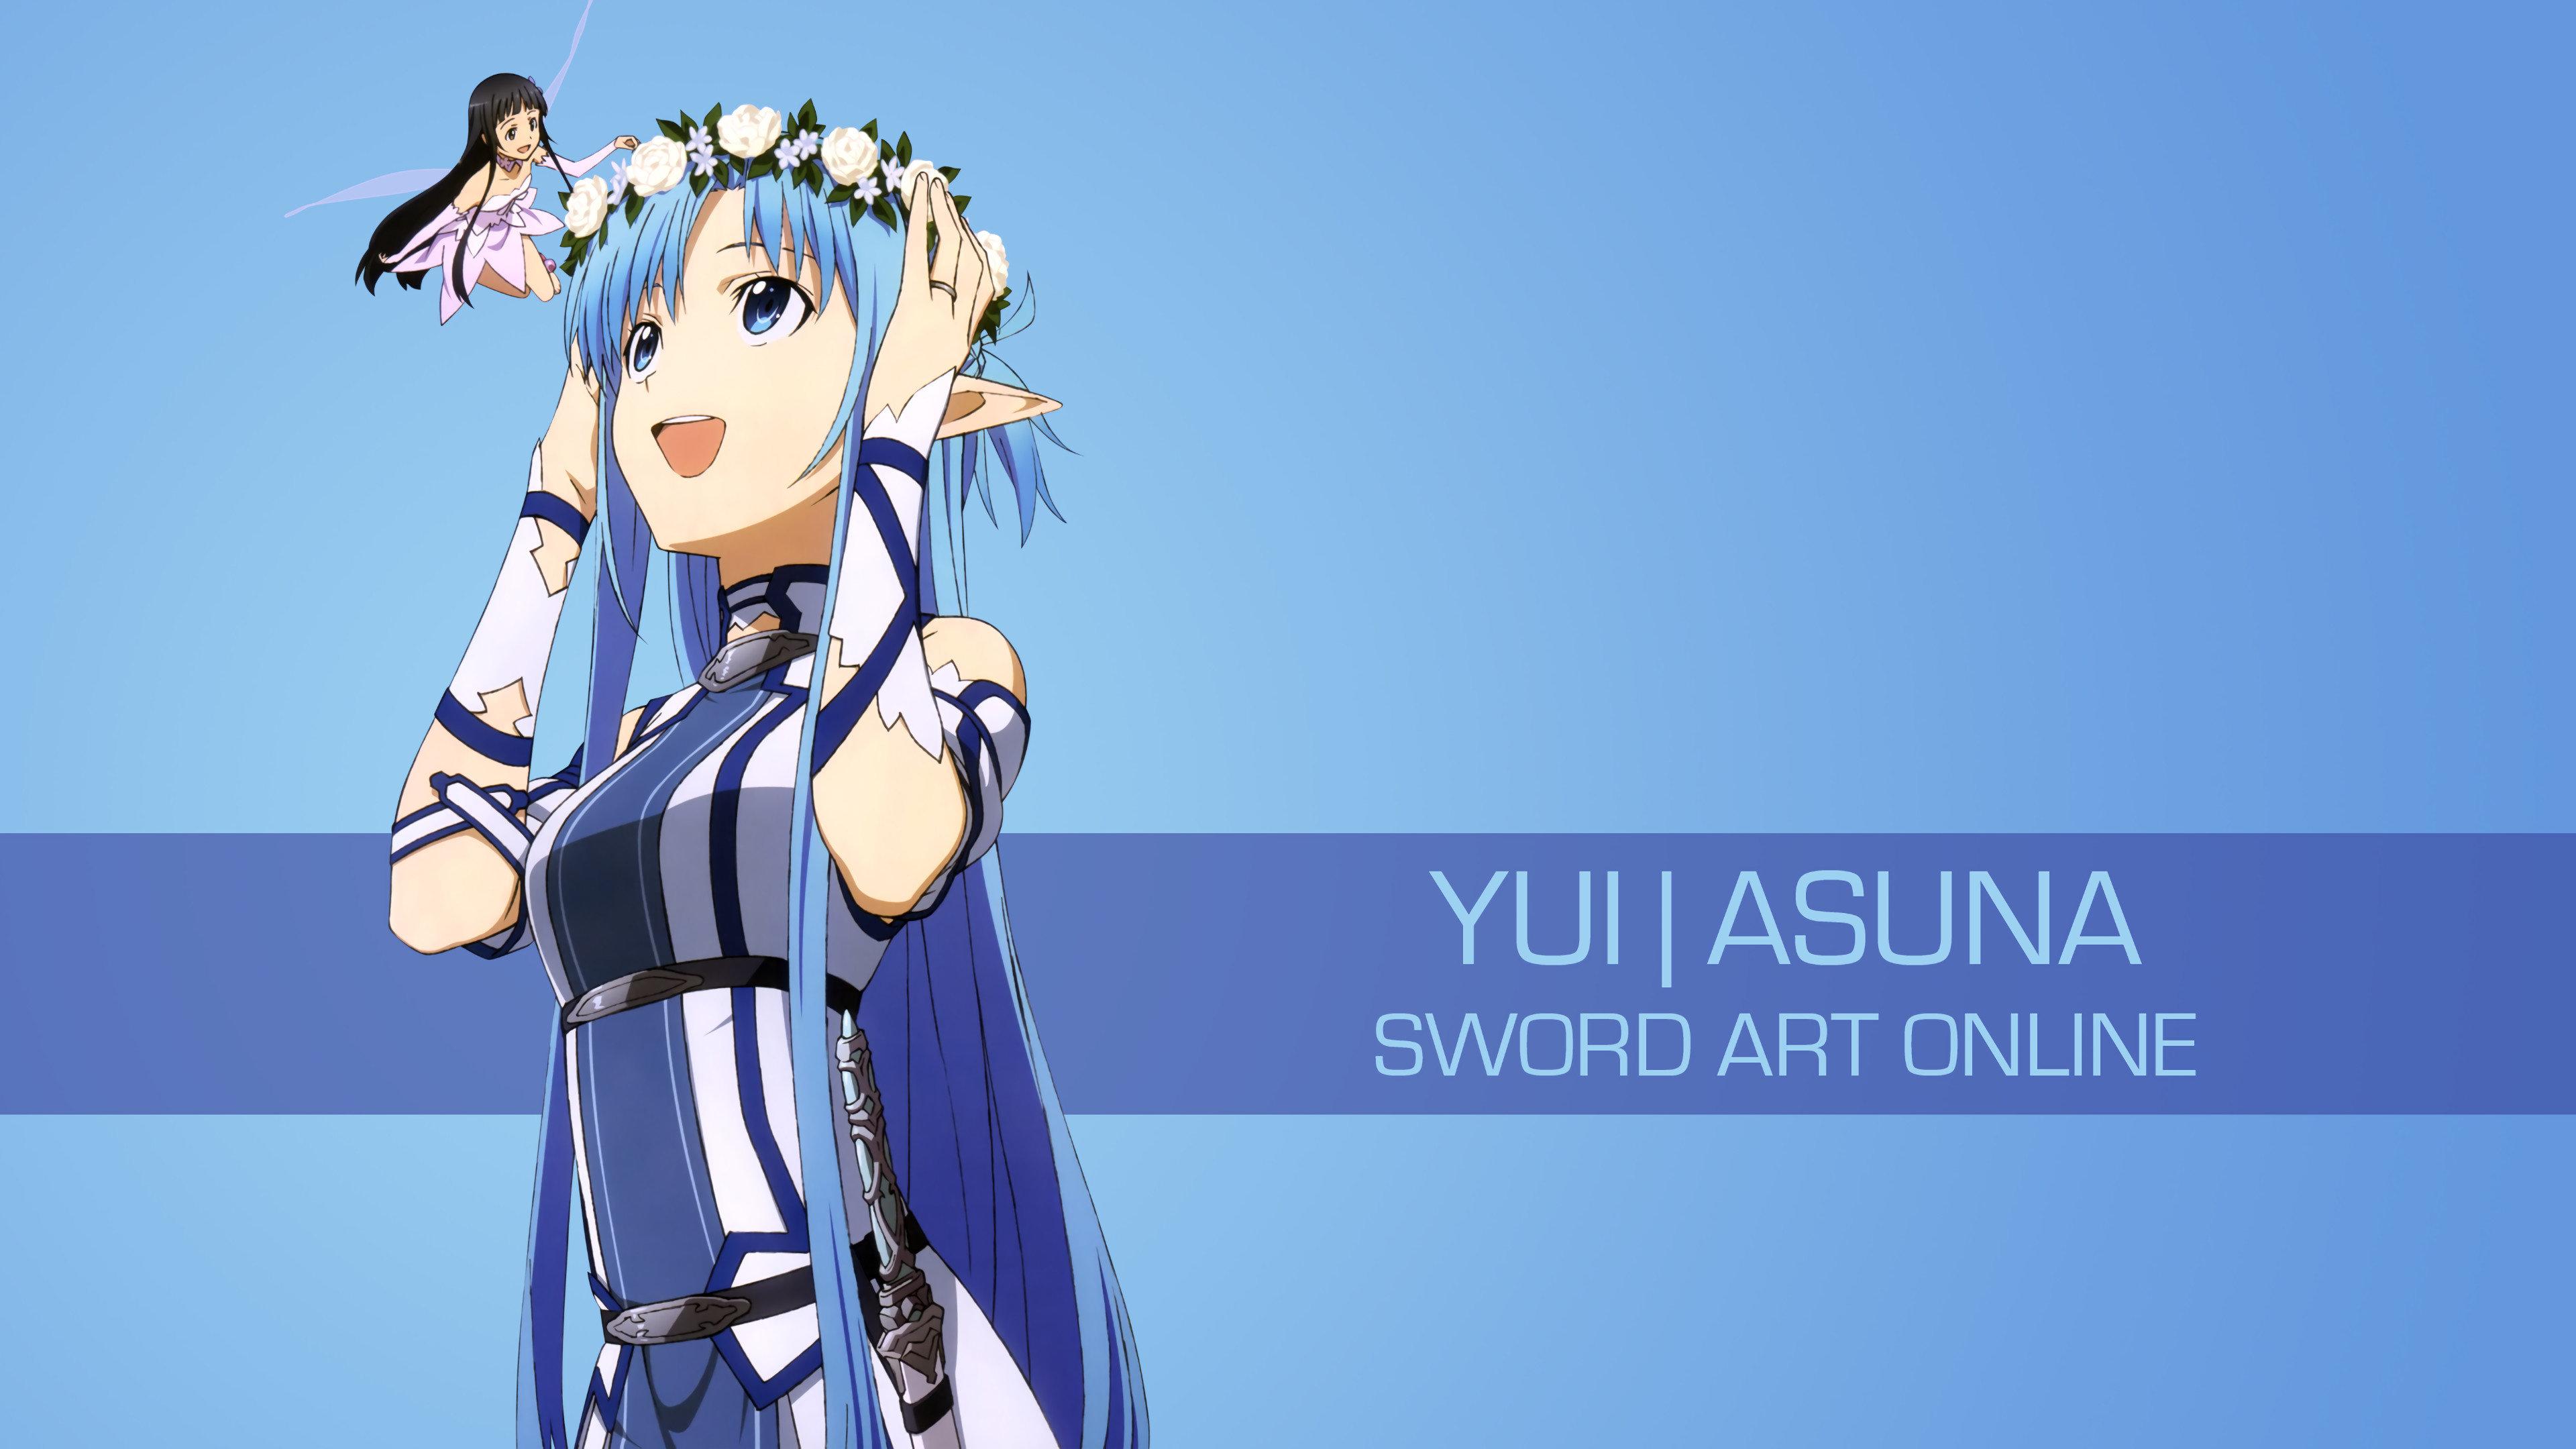 Sword Art Online Sao Wallpapers 3840x2160 Ultra Hd 4k